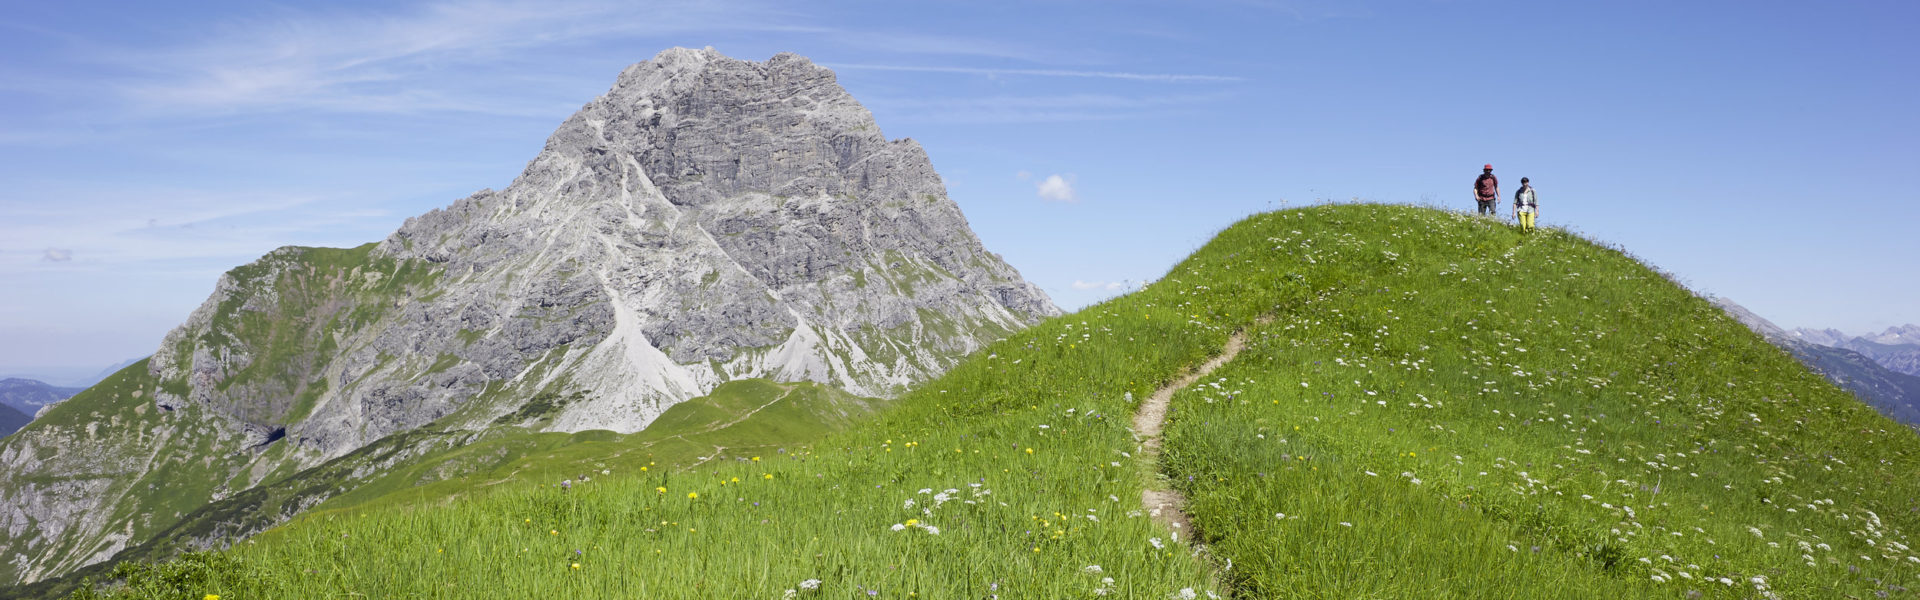 Min Weag-Etappe 9, Online Wanderkarte © Peter Mathis / Vorarlberg Tourismus